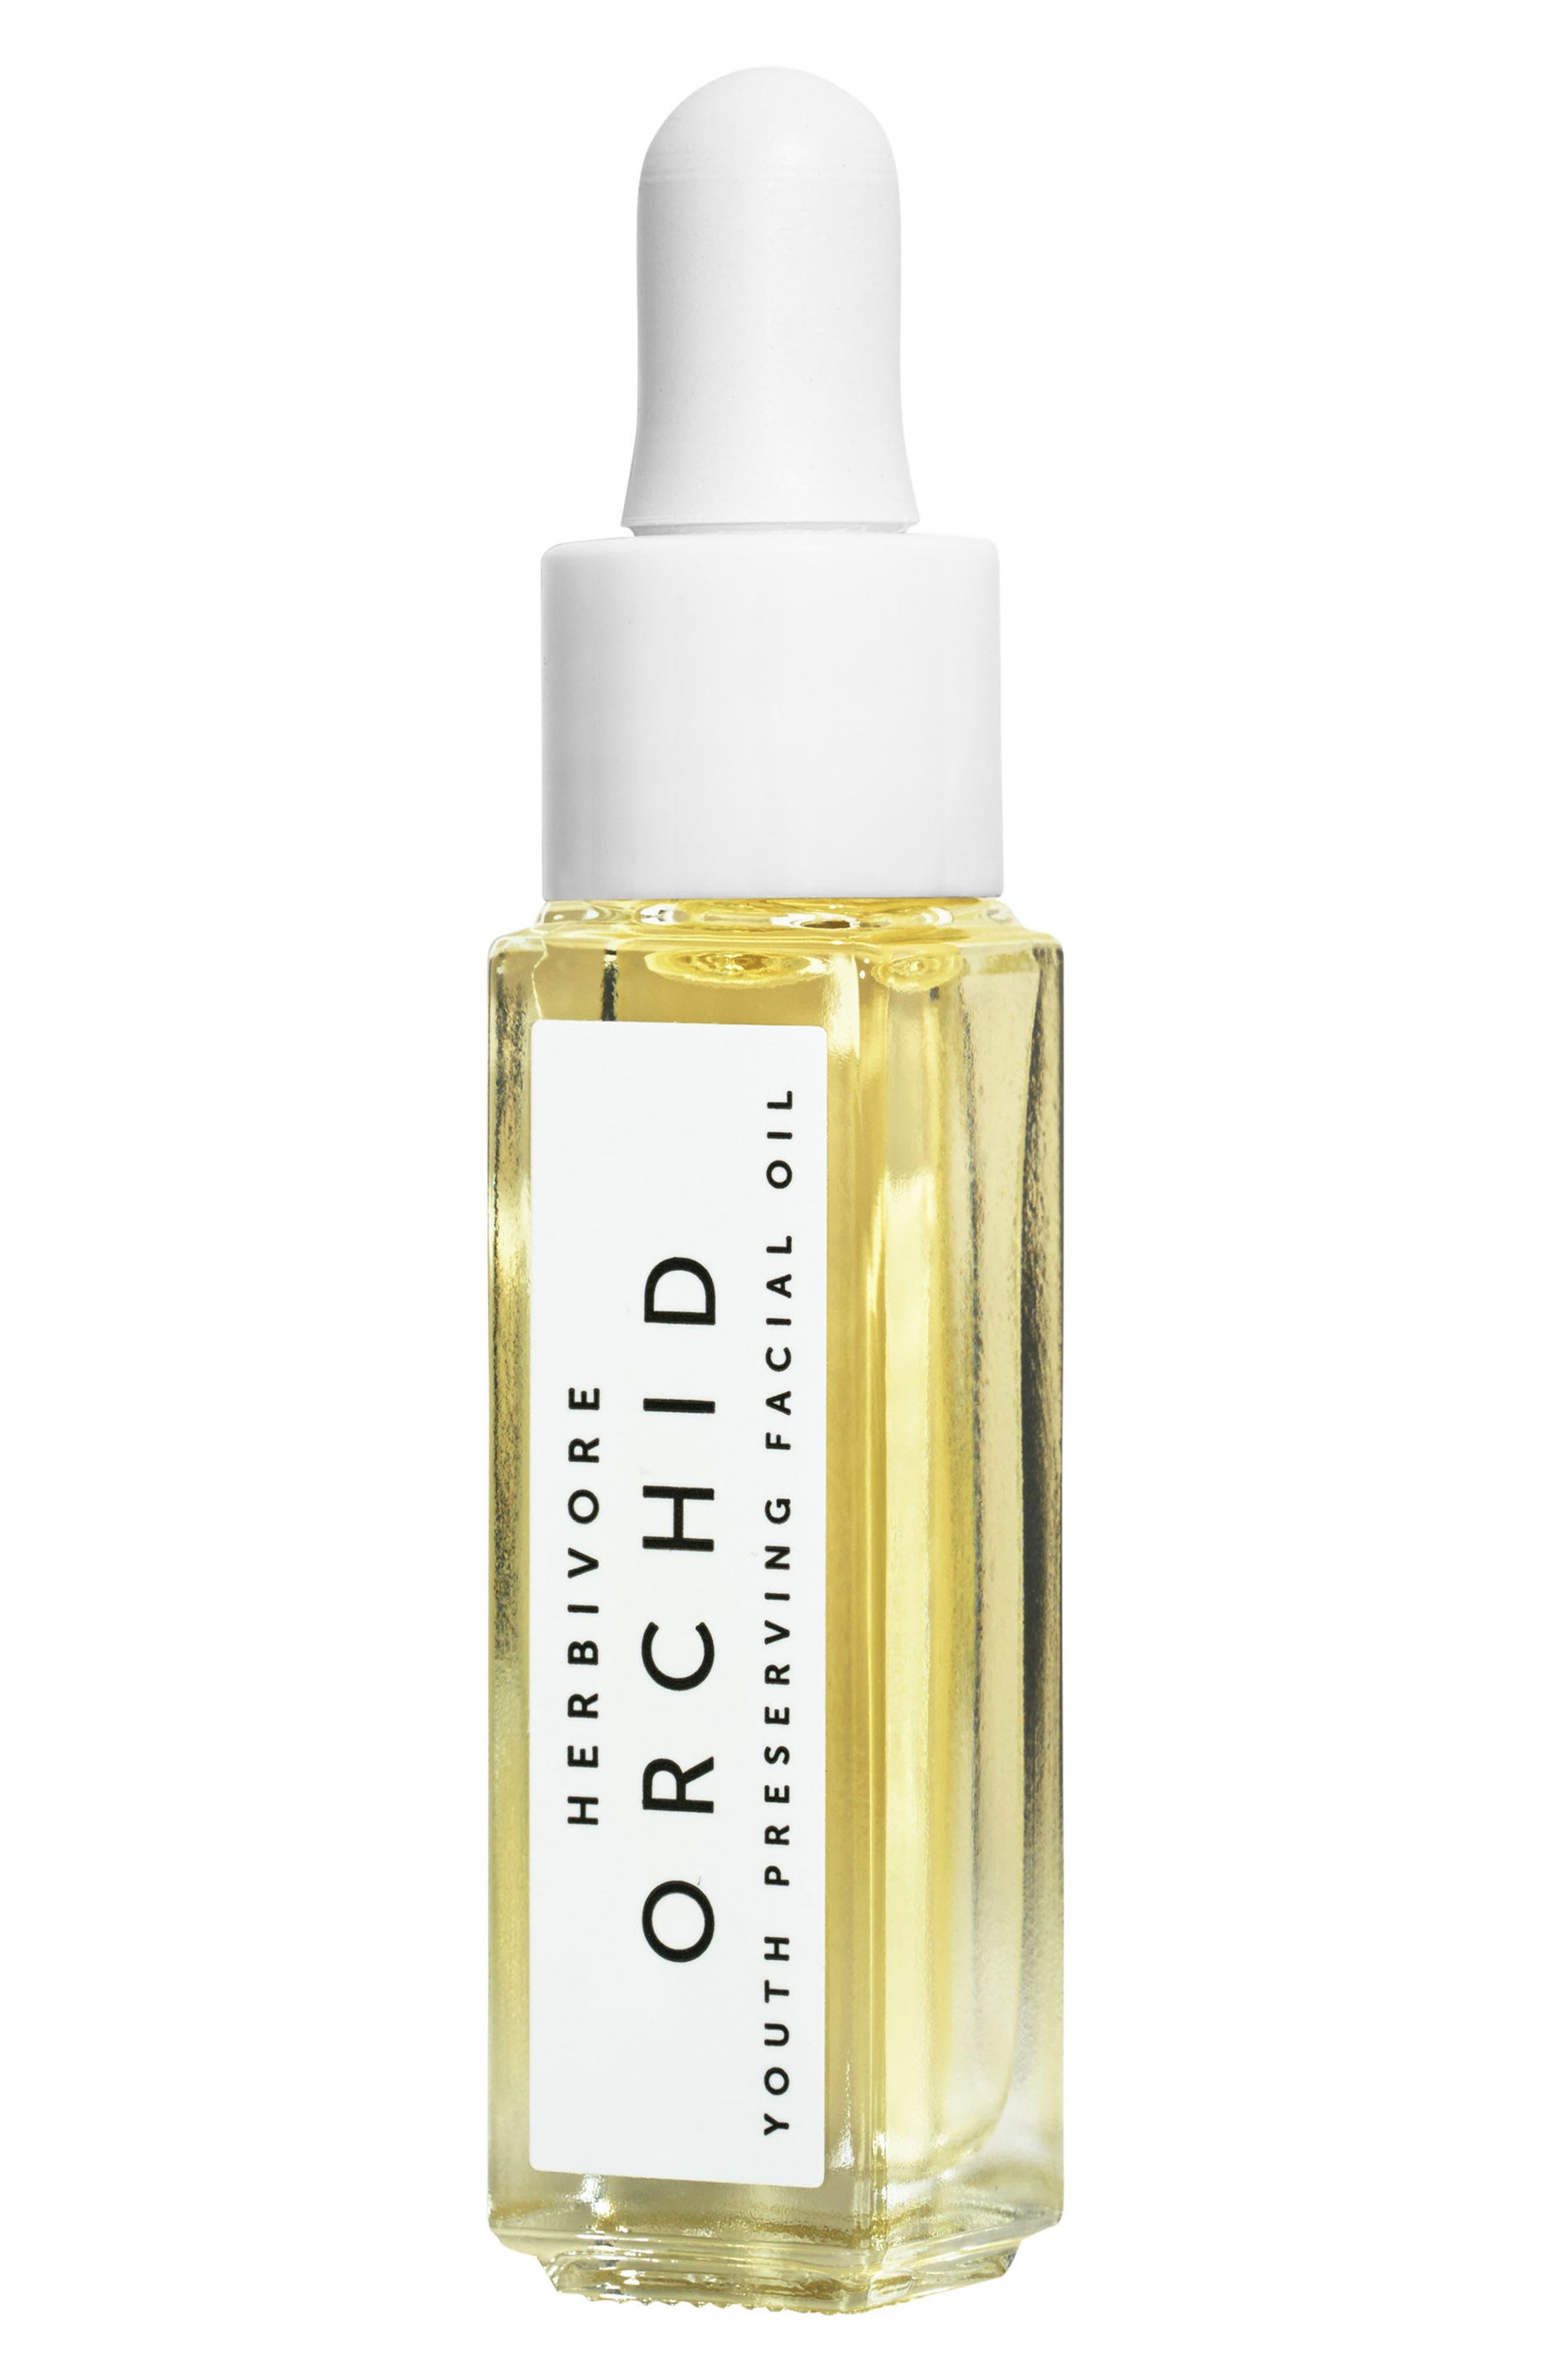 Orchid Mini Facial Oil,                             Main thumbnail 1, color,                             No Color